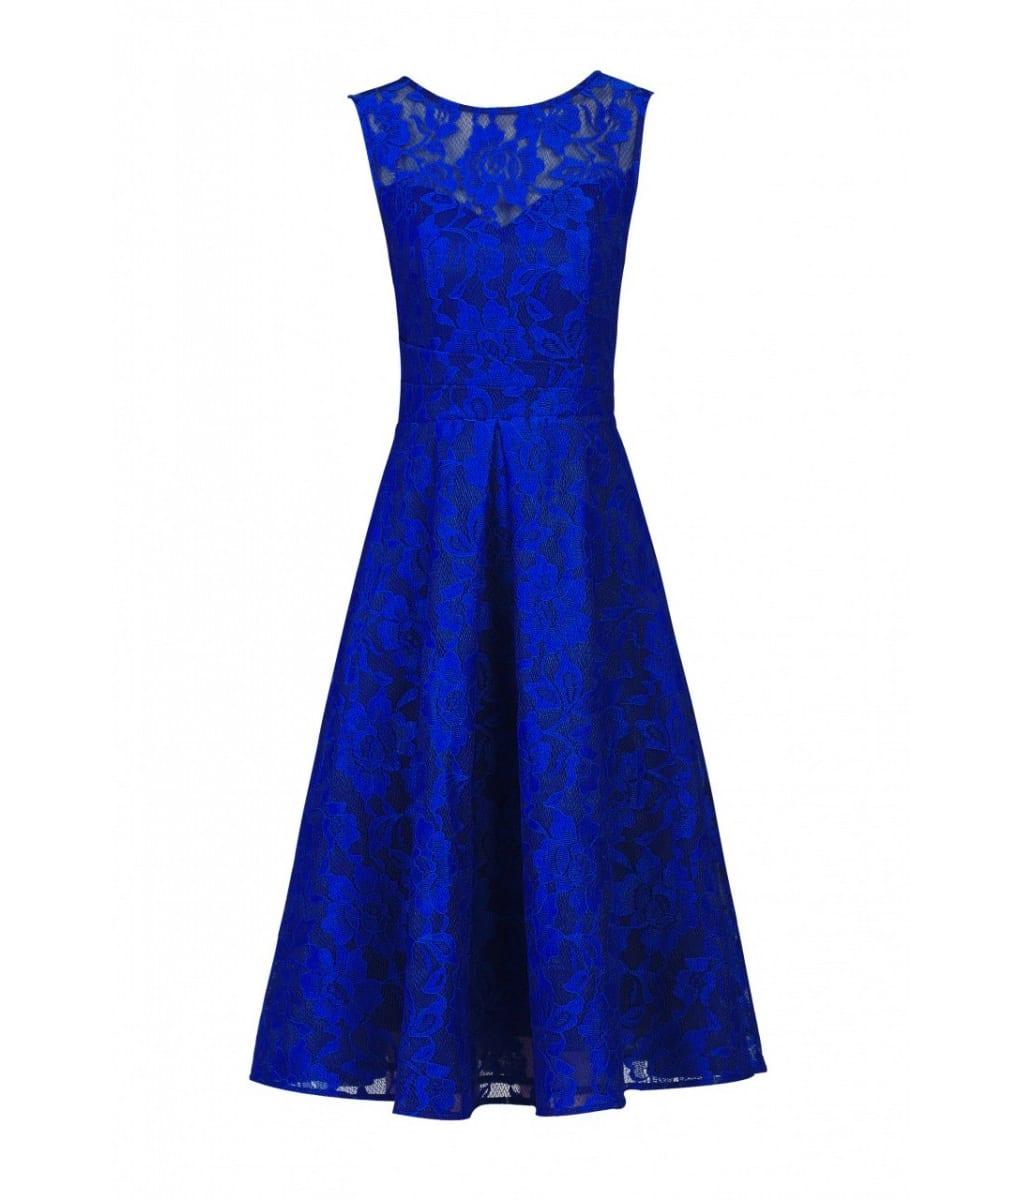 Alila-Royal-blue-Lace-Bonded-Prom-Dress-royal-Jolie-Moi